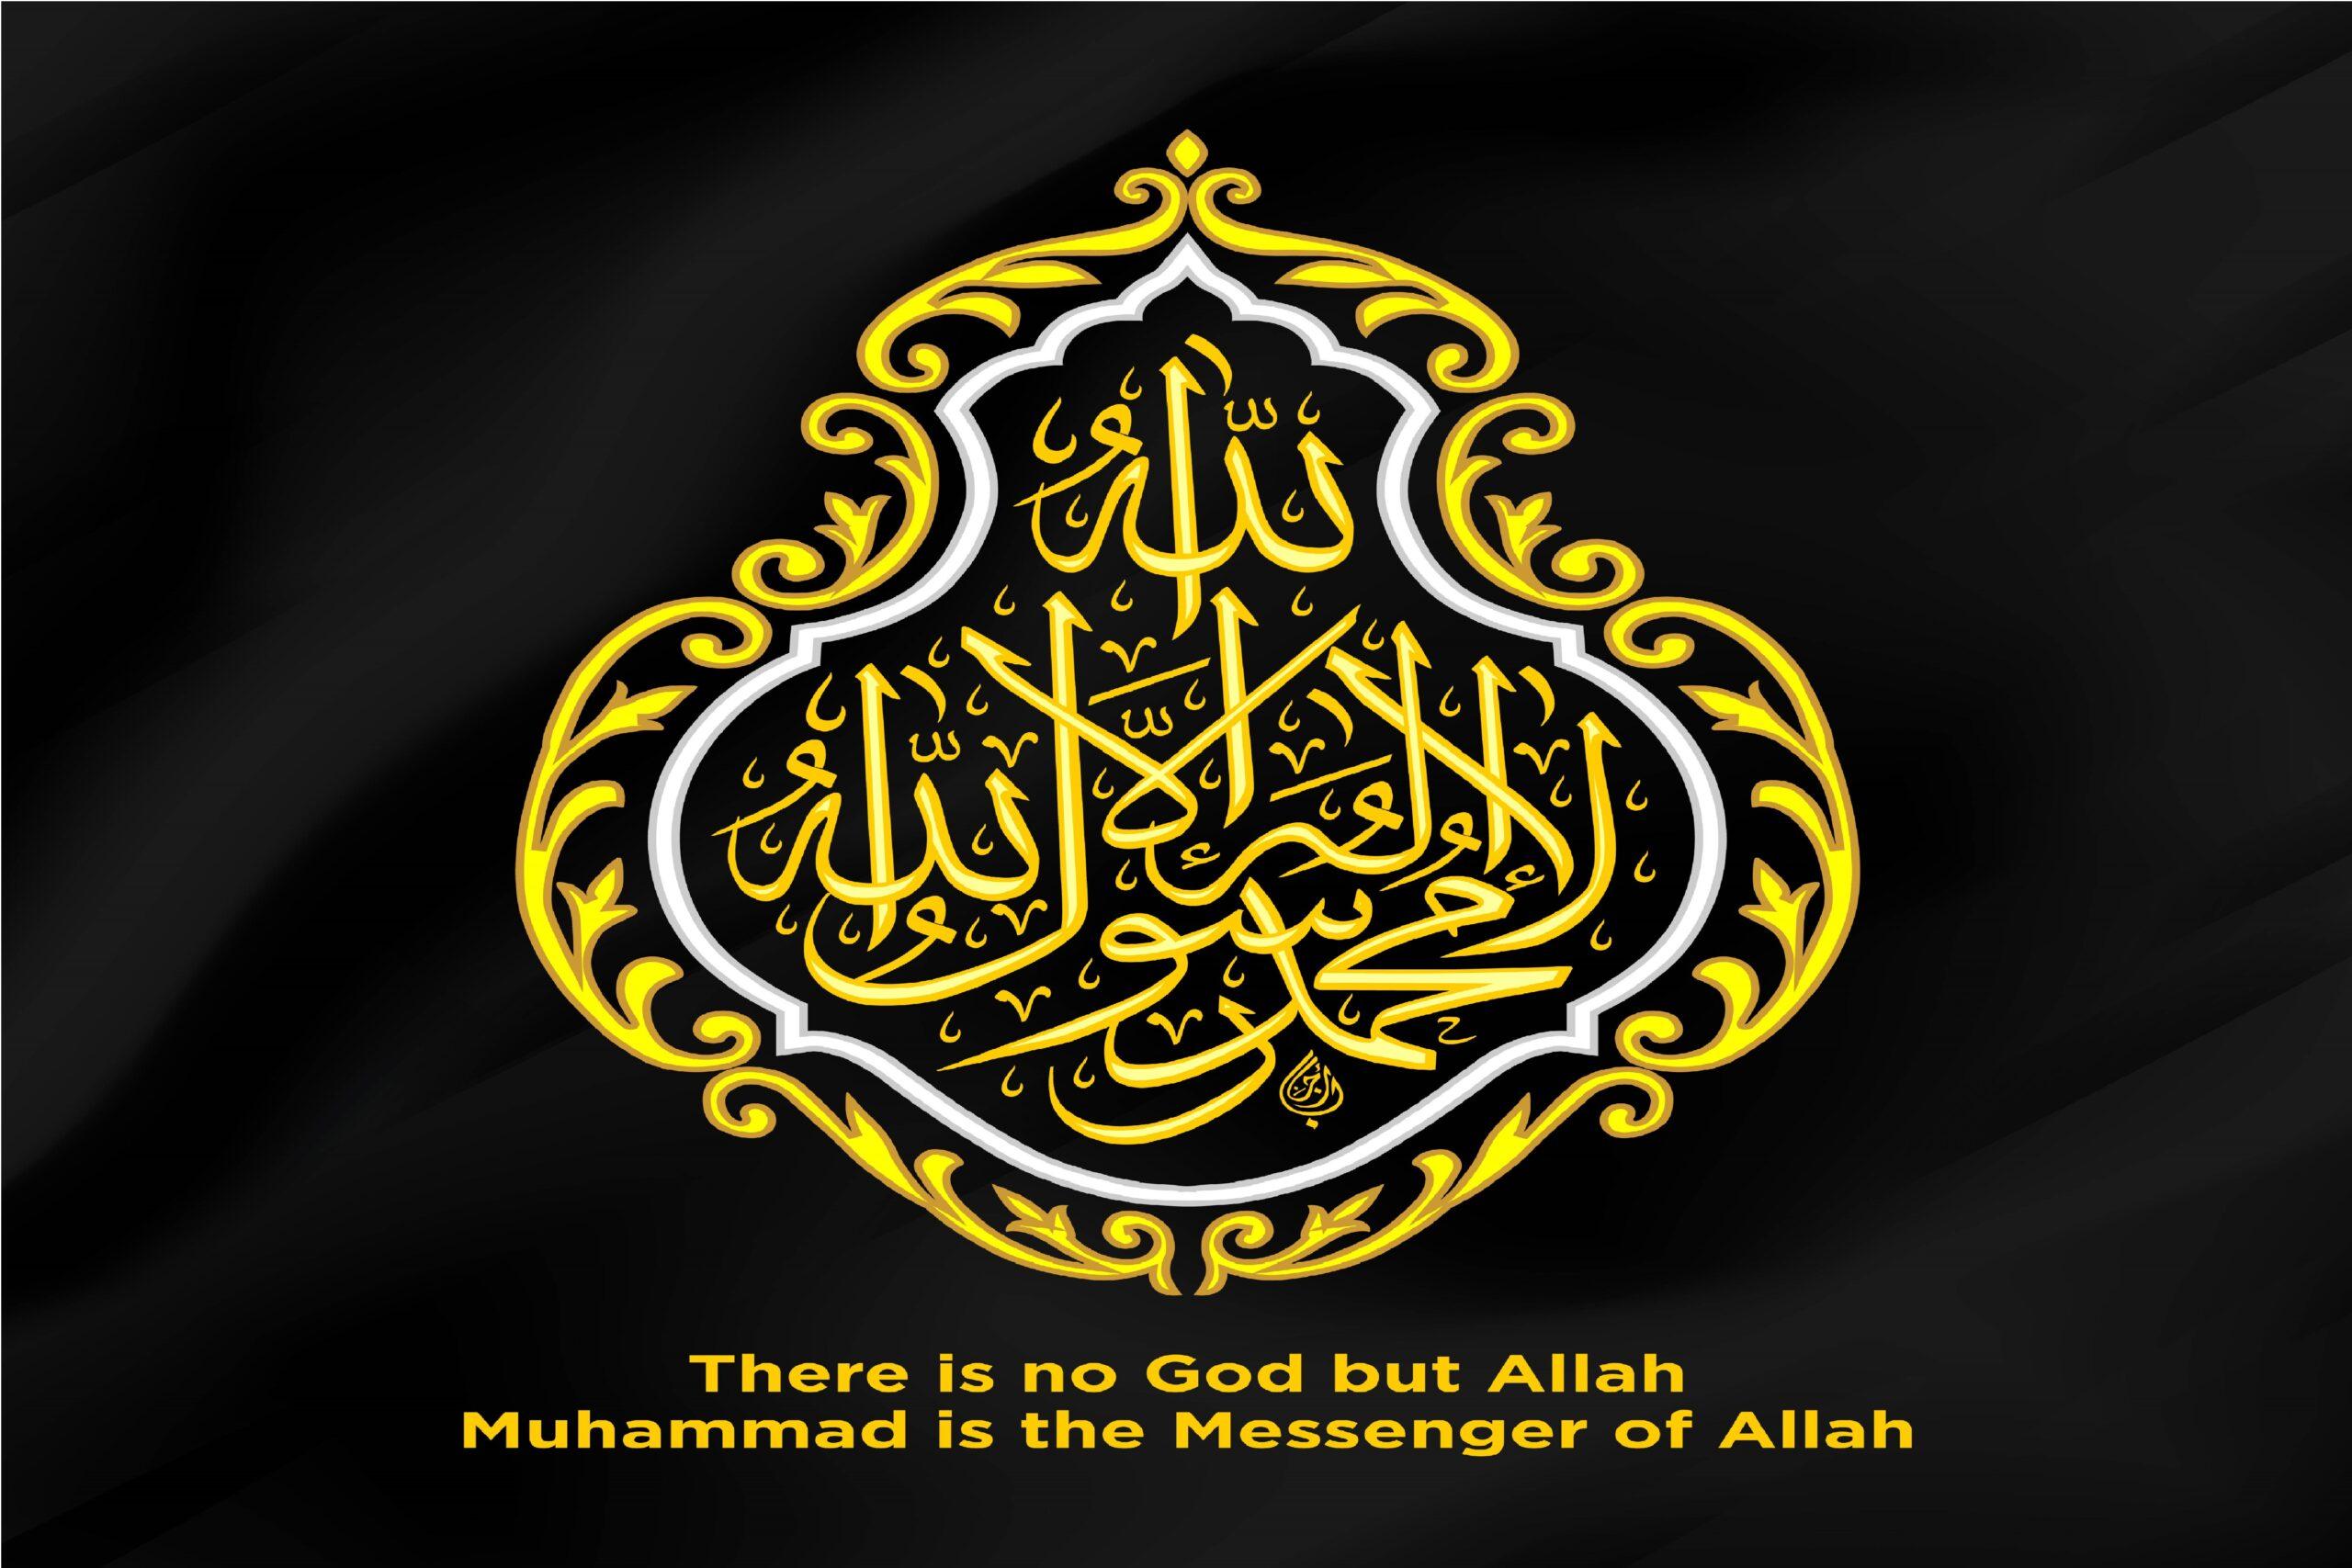 Islamic Studies Course - Daily Masnoon Dua and Supplications - Fiqh - Hadith - Sirah - Tafseer - Aqeedah.